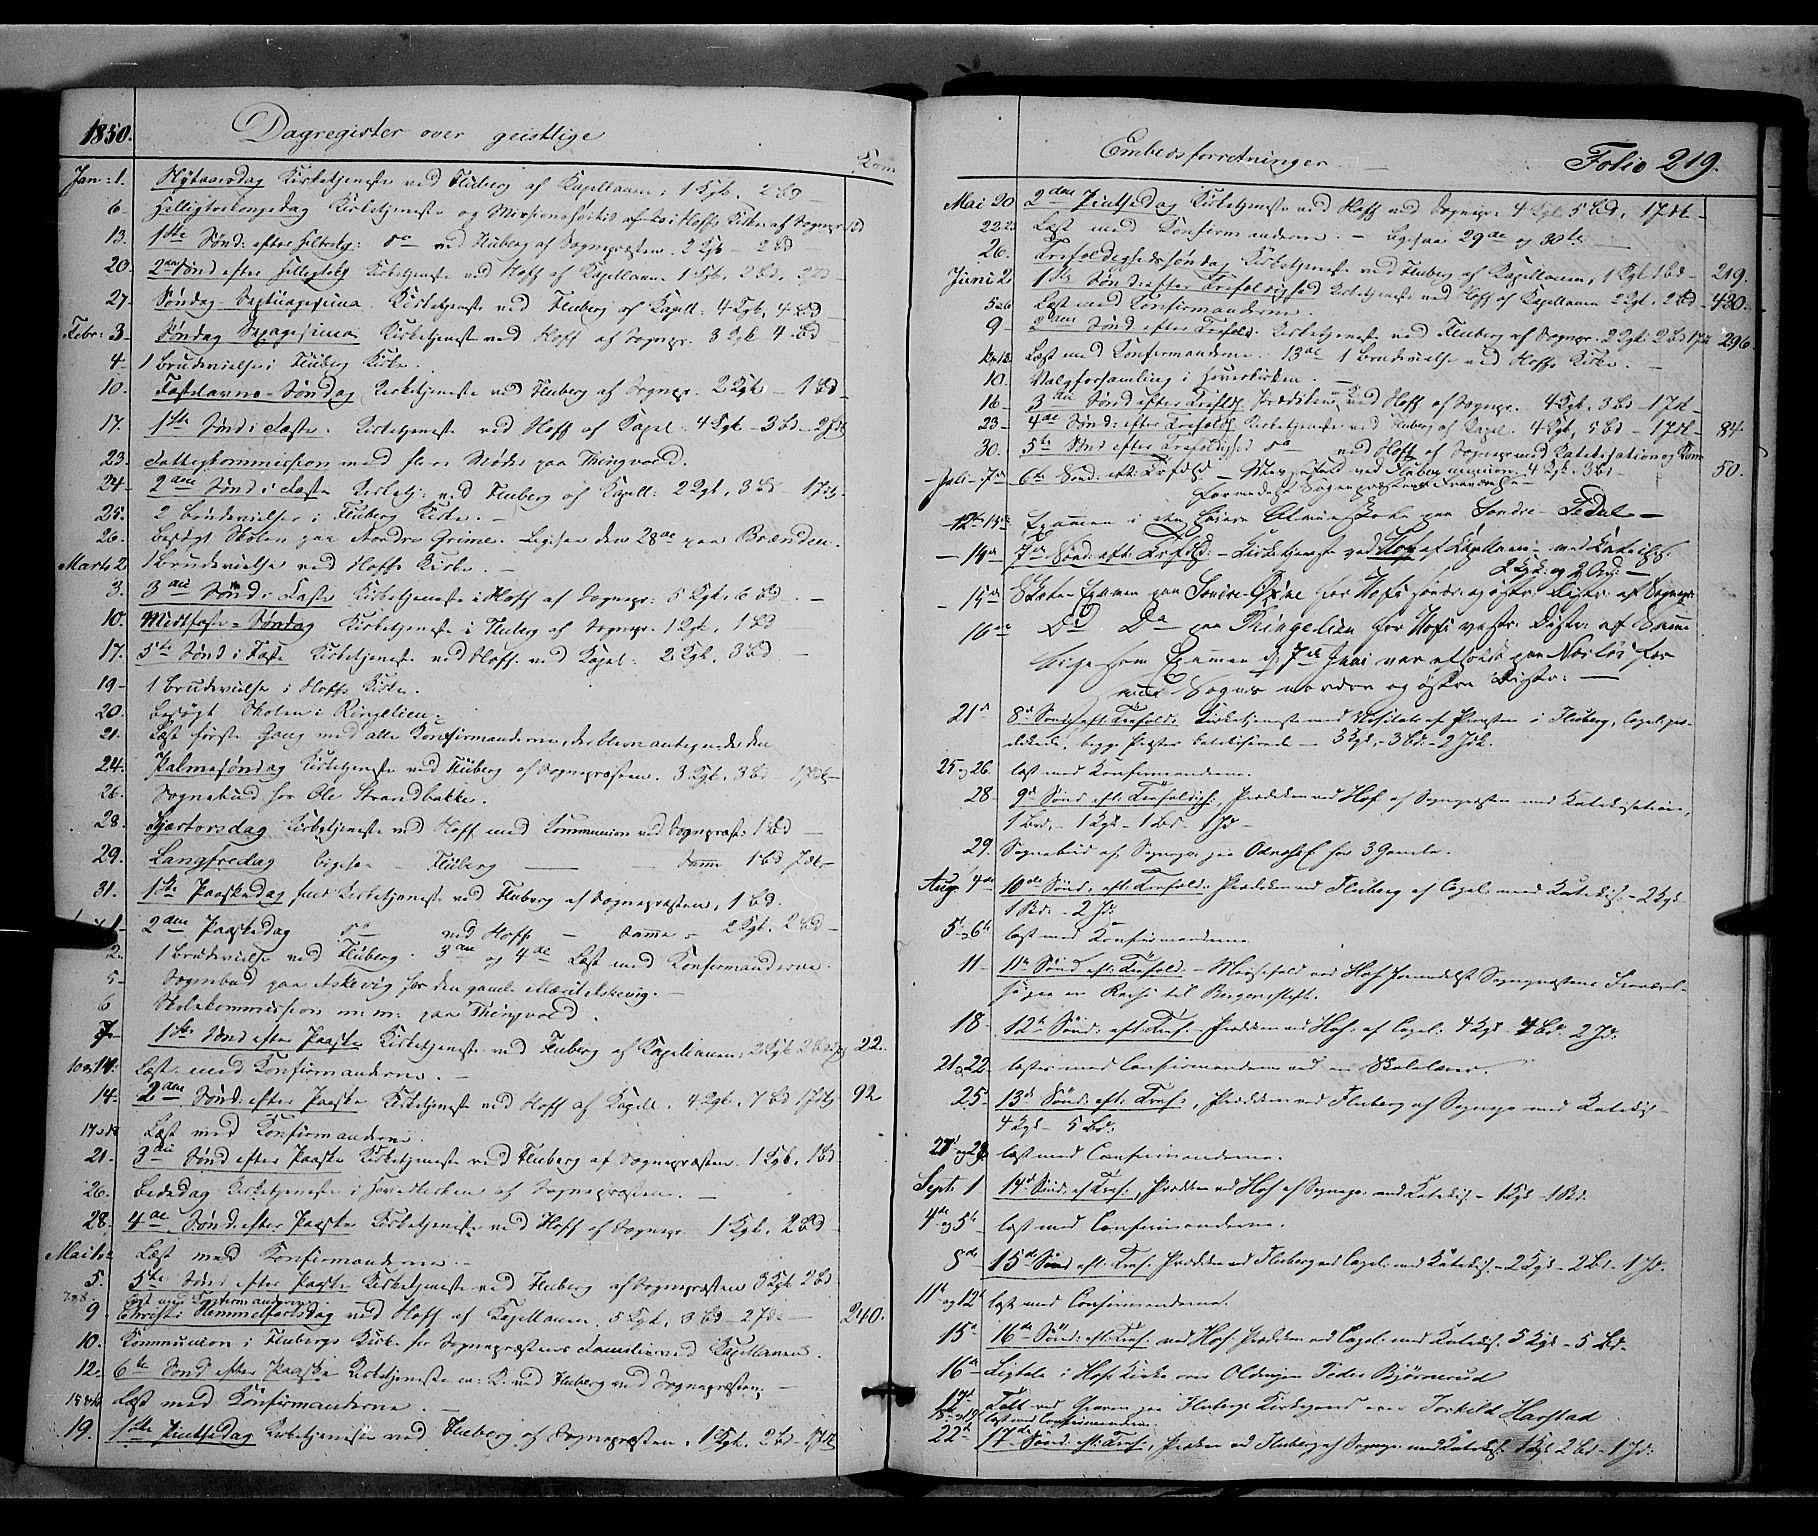 SAH, Land prestekontor, Ministerialbok nr. 9, 1847-1859, s. 219